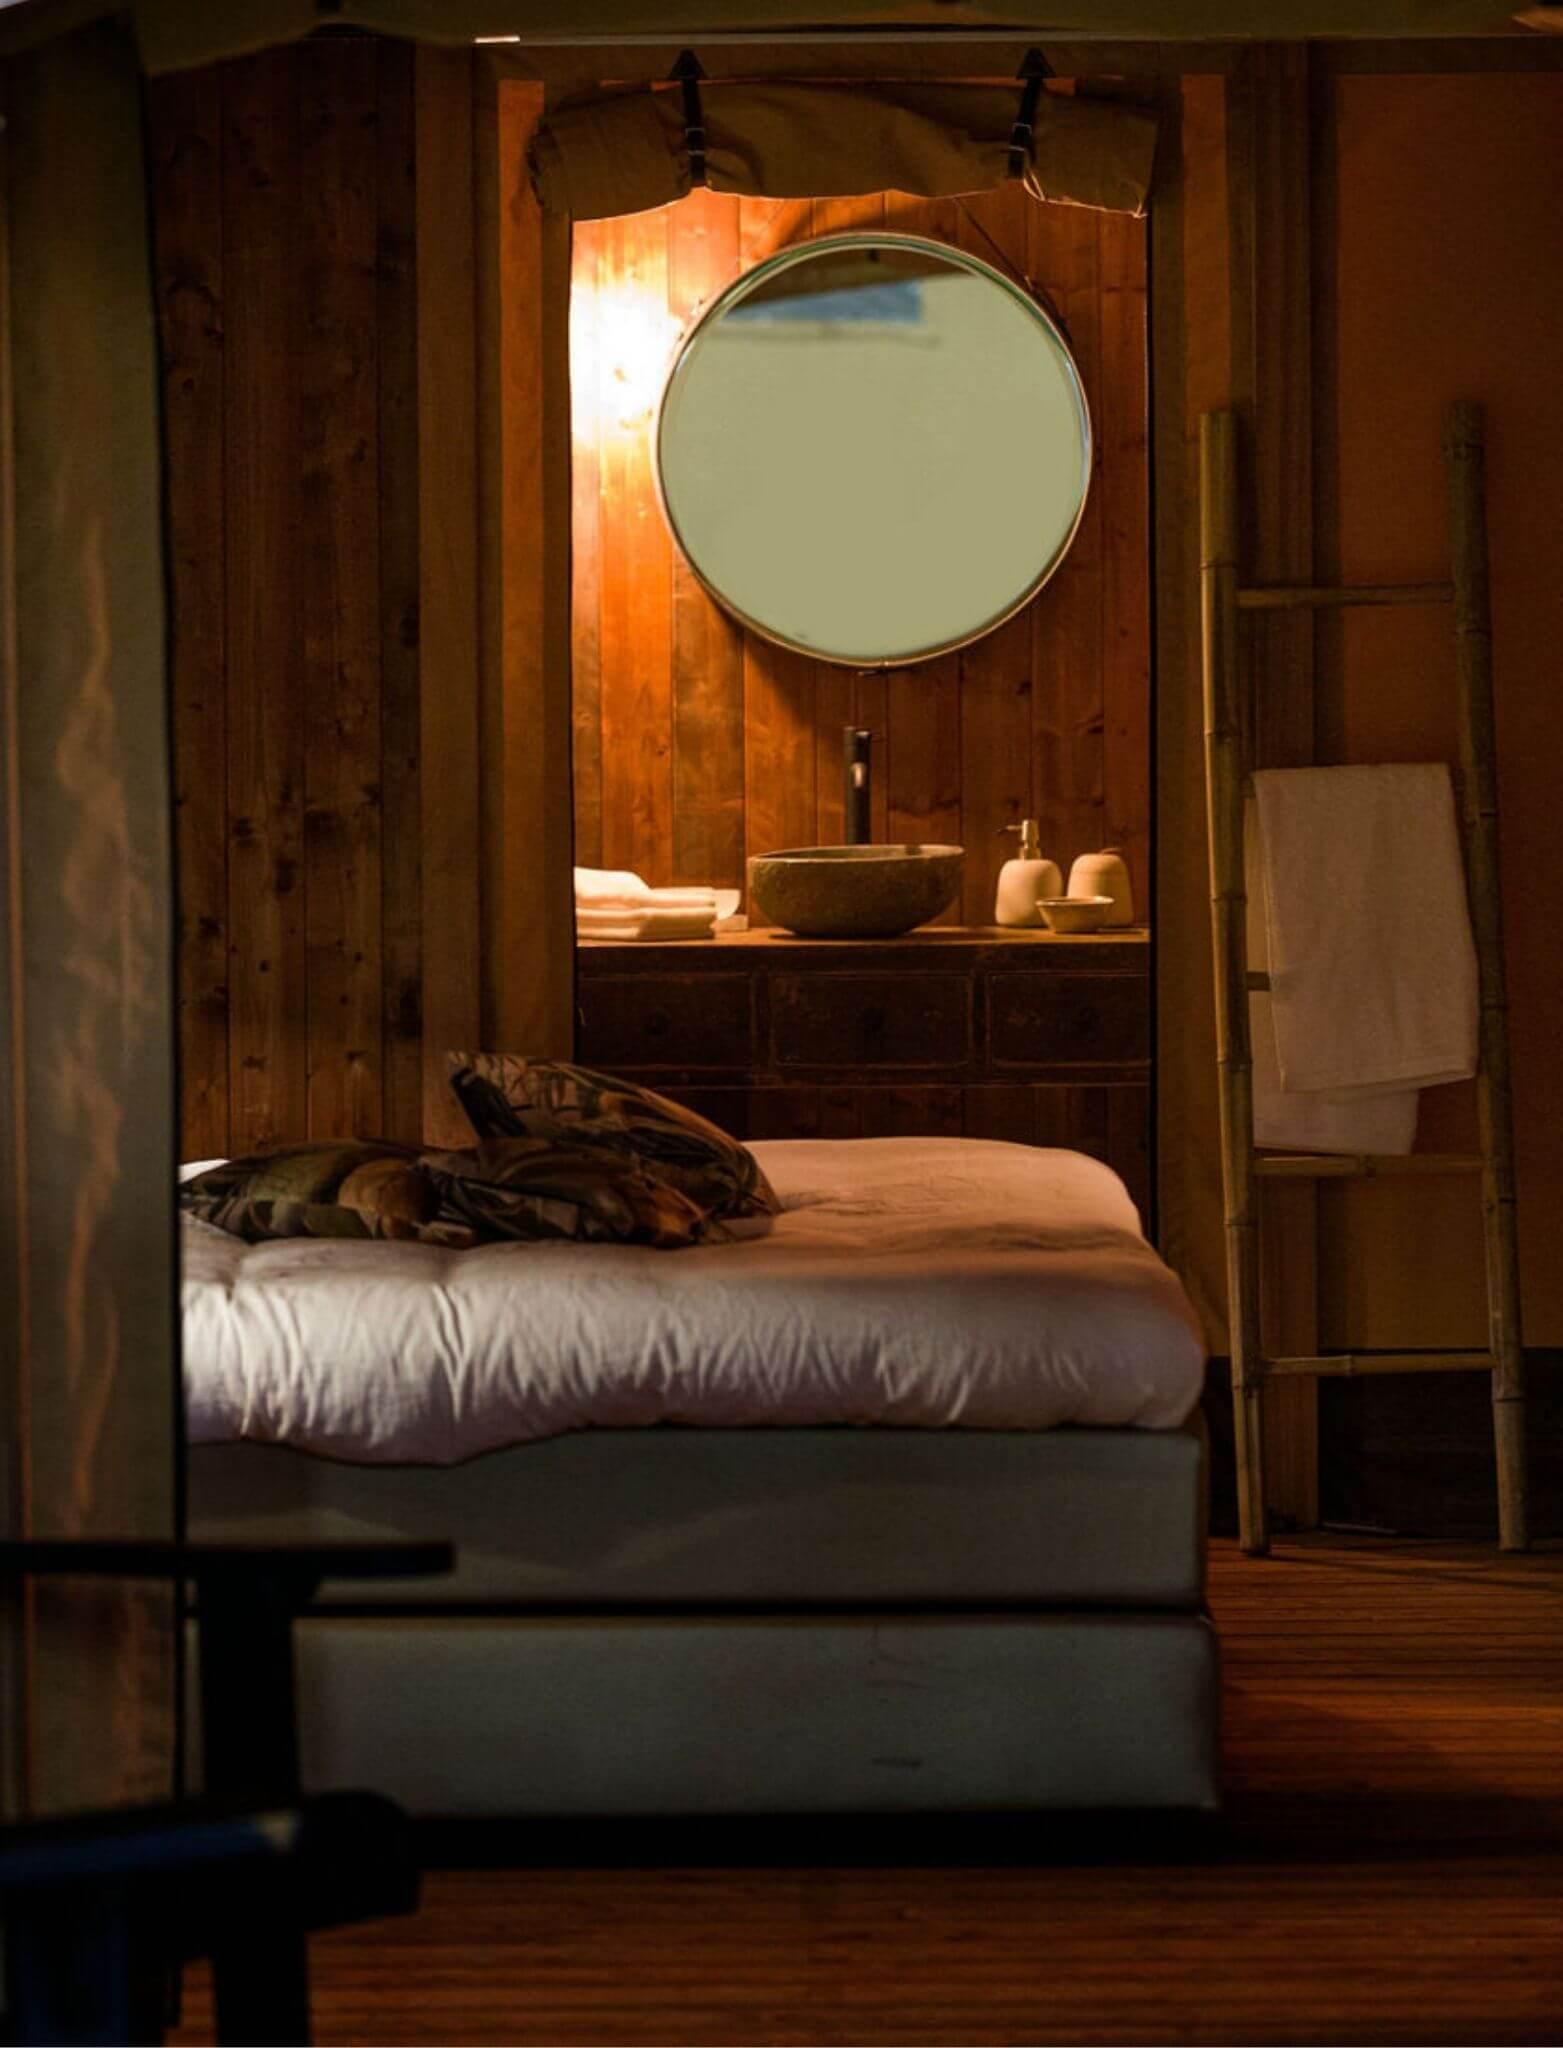 YALA_bedroom_bathroom_detail_interior_Pristine